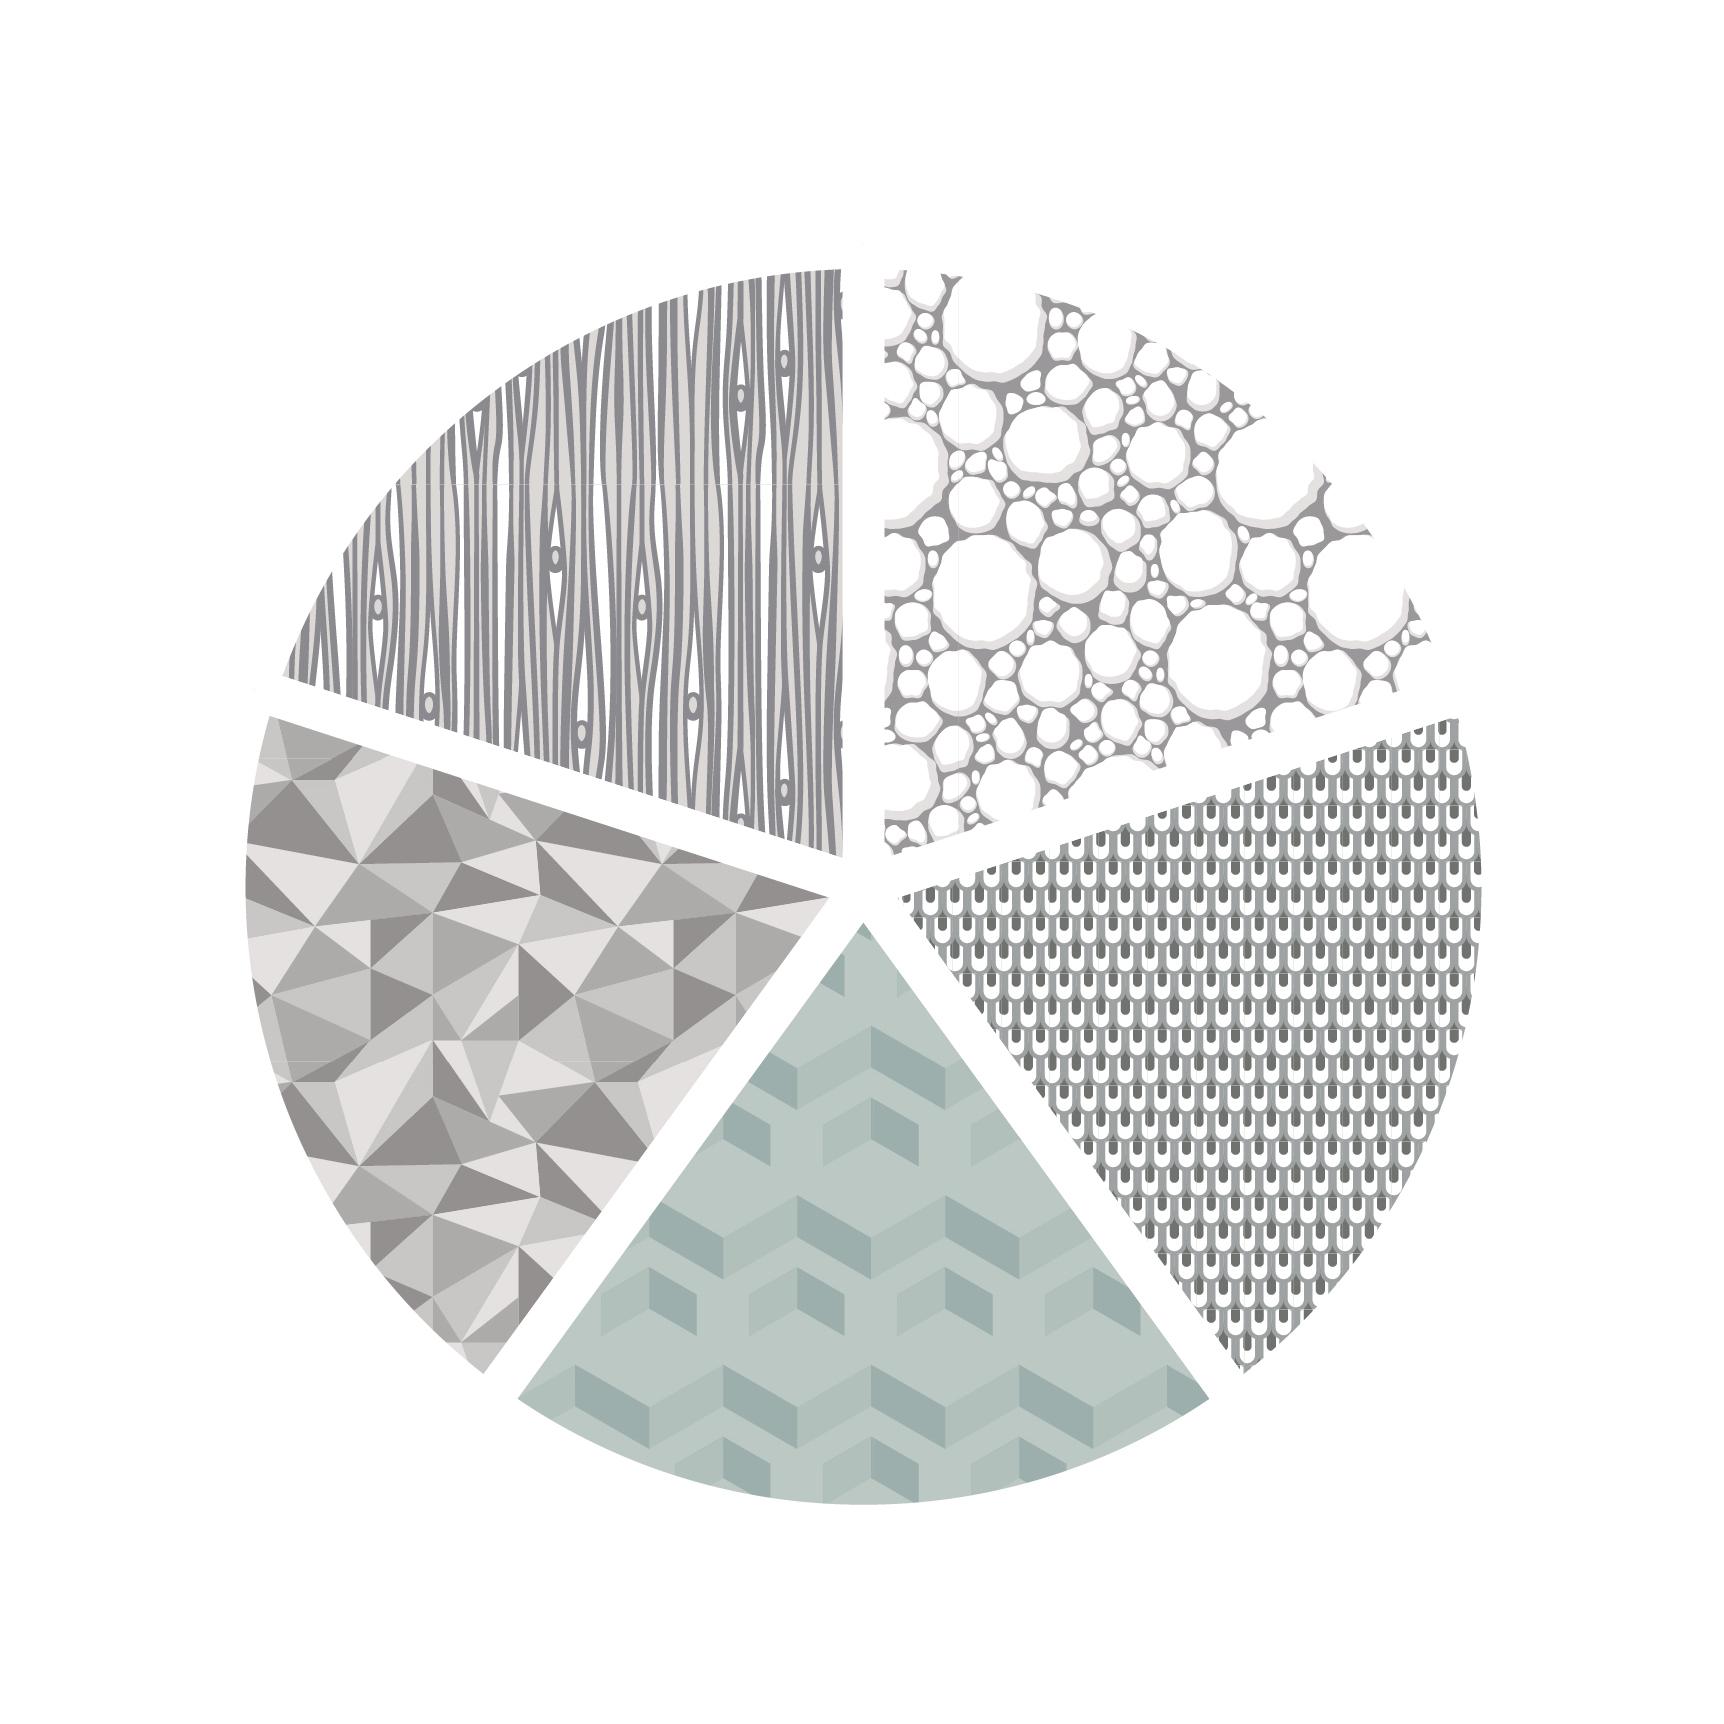 KayleeMenard_Illustration_ManInTheMarsh_Patterns.jpg